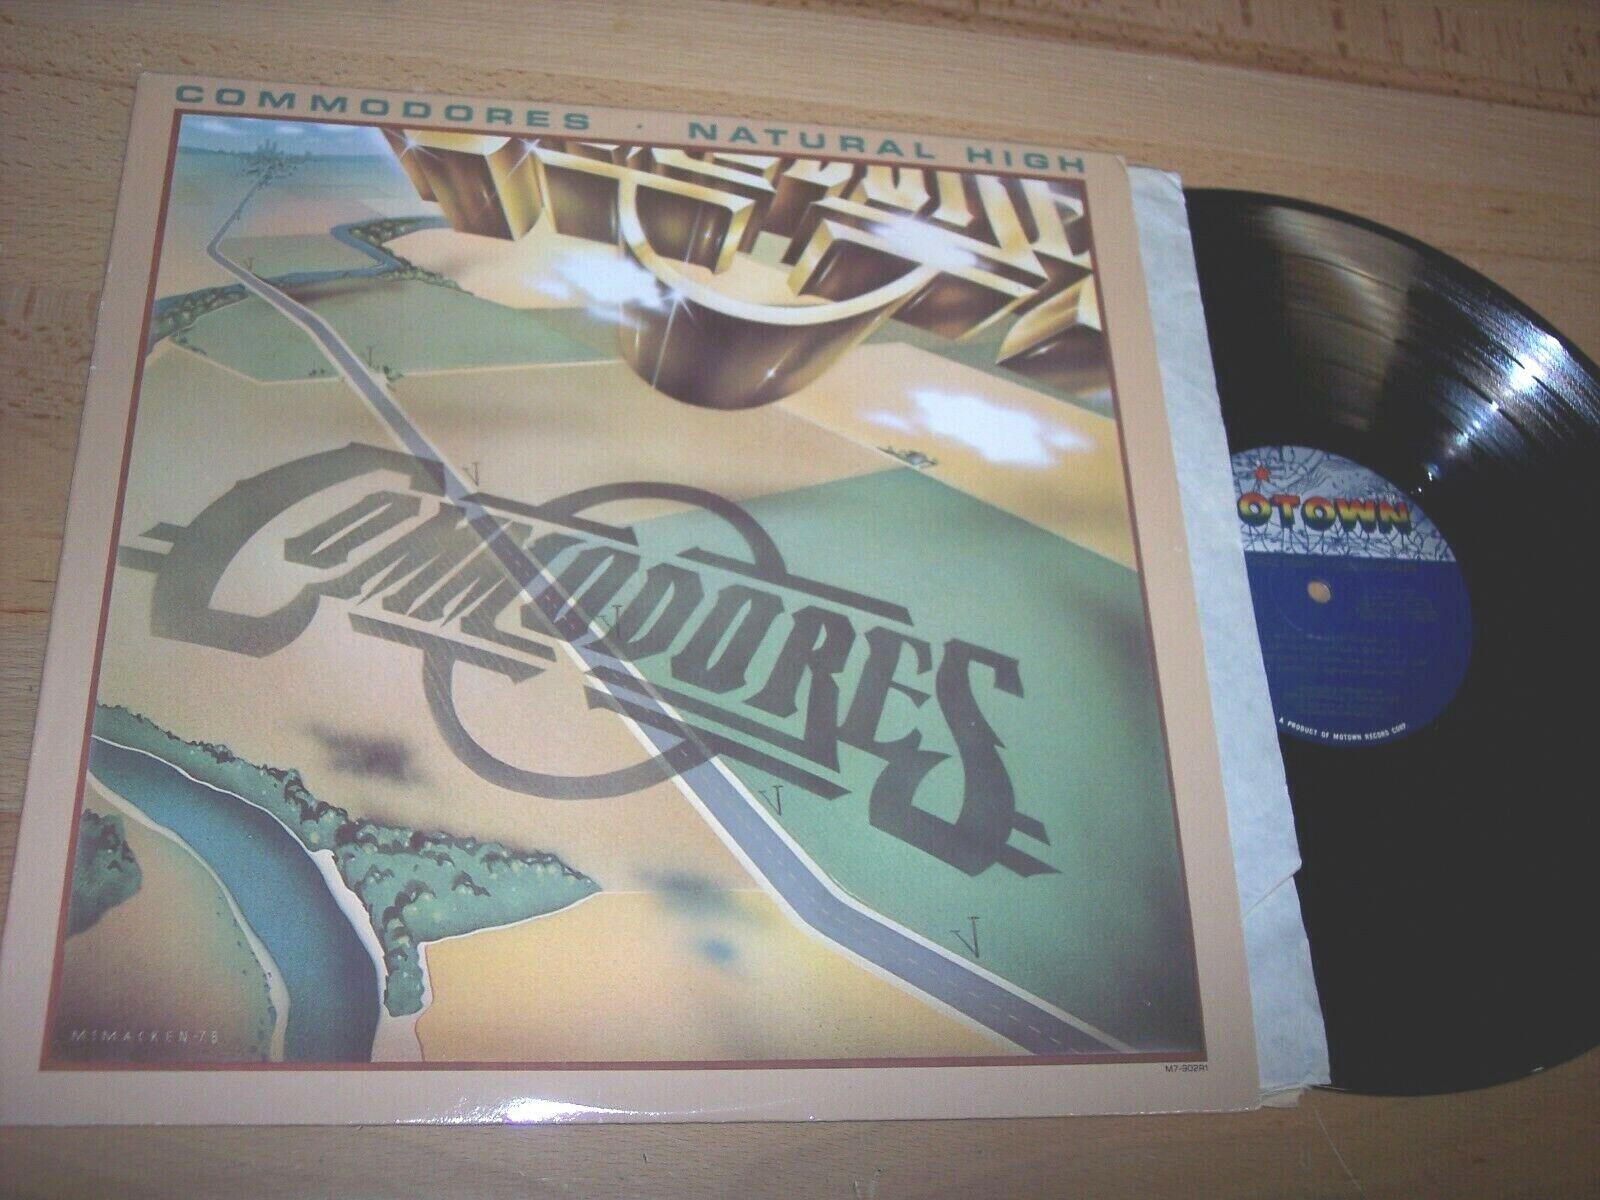 VG 1978 Commodores Natural High LP Album - $4.99